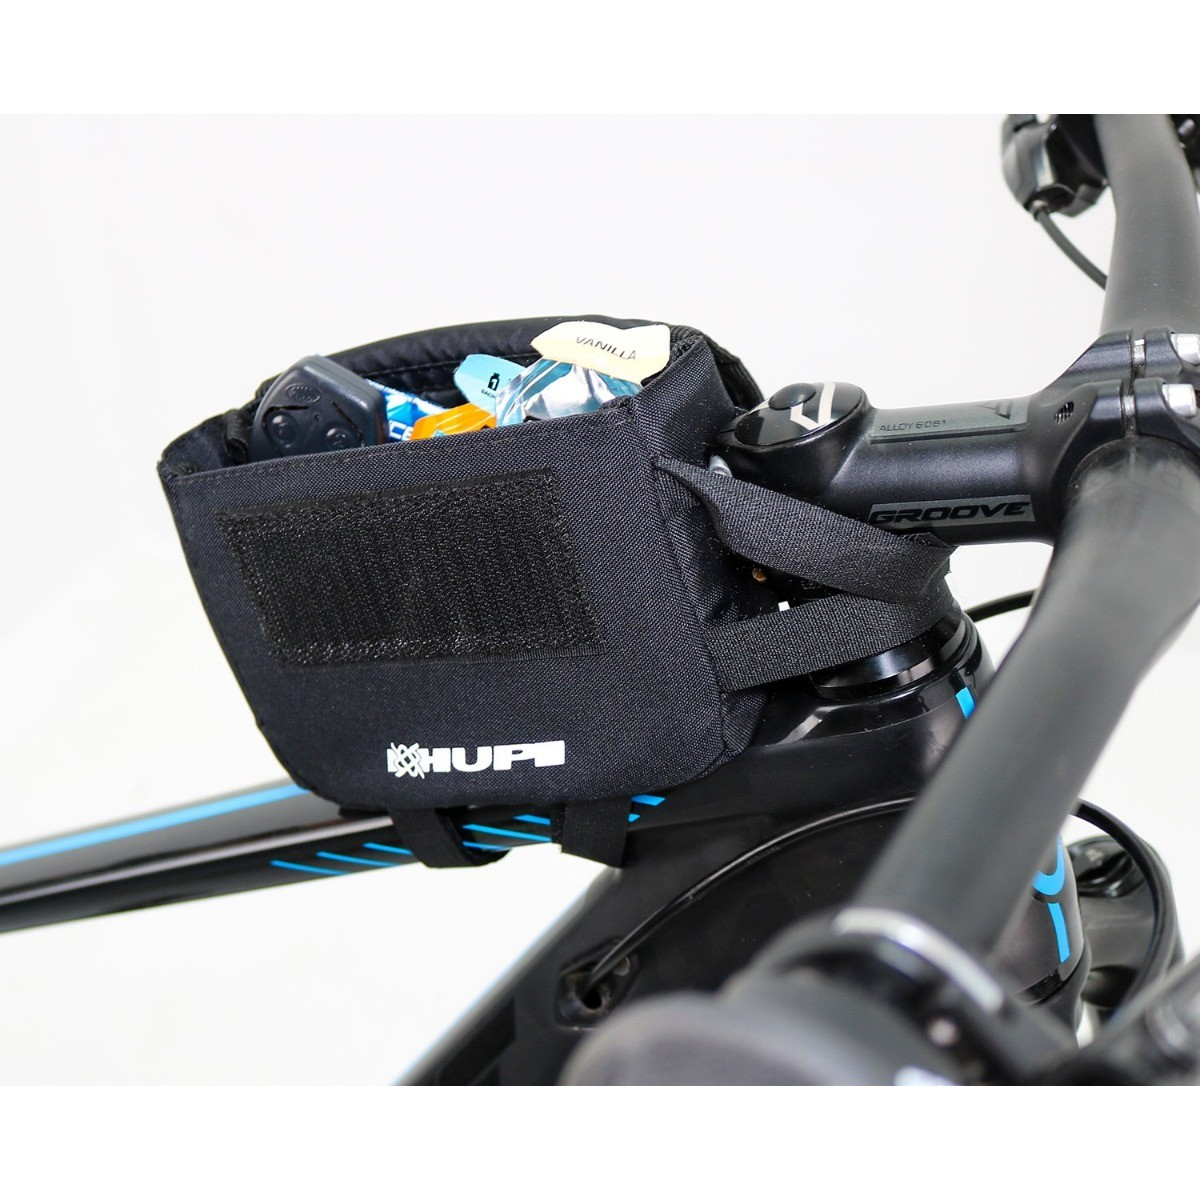 Bolsa Quadro Hupi Mini ciclismo